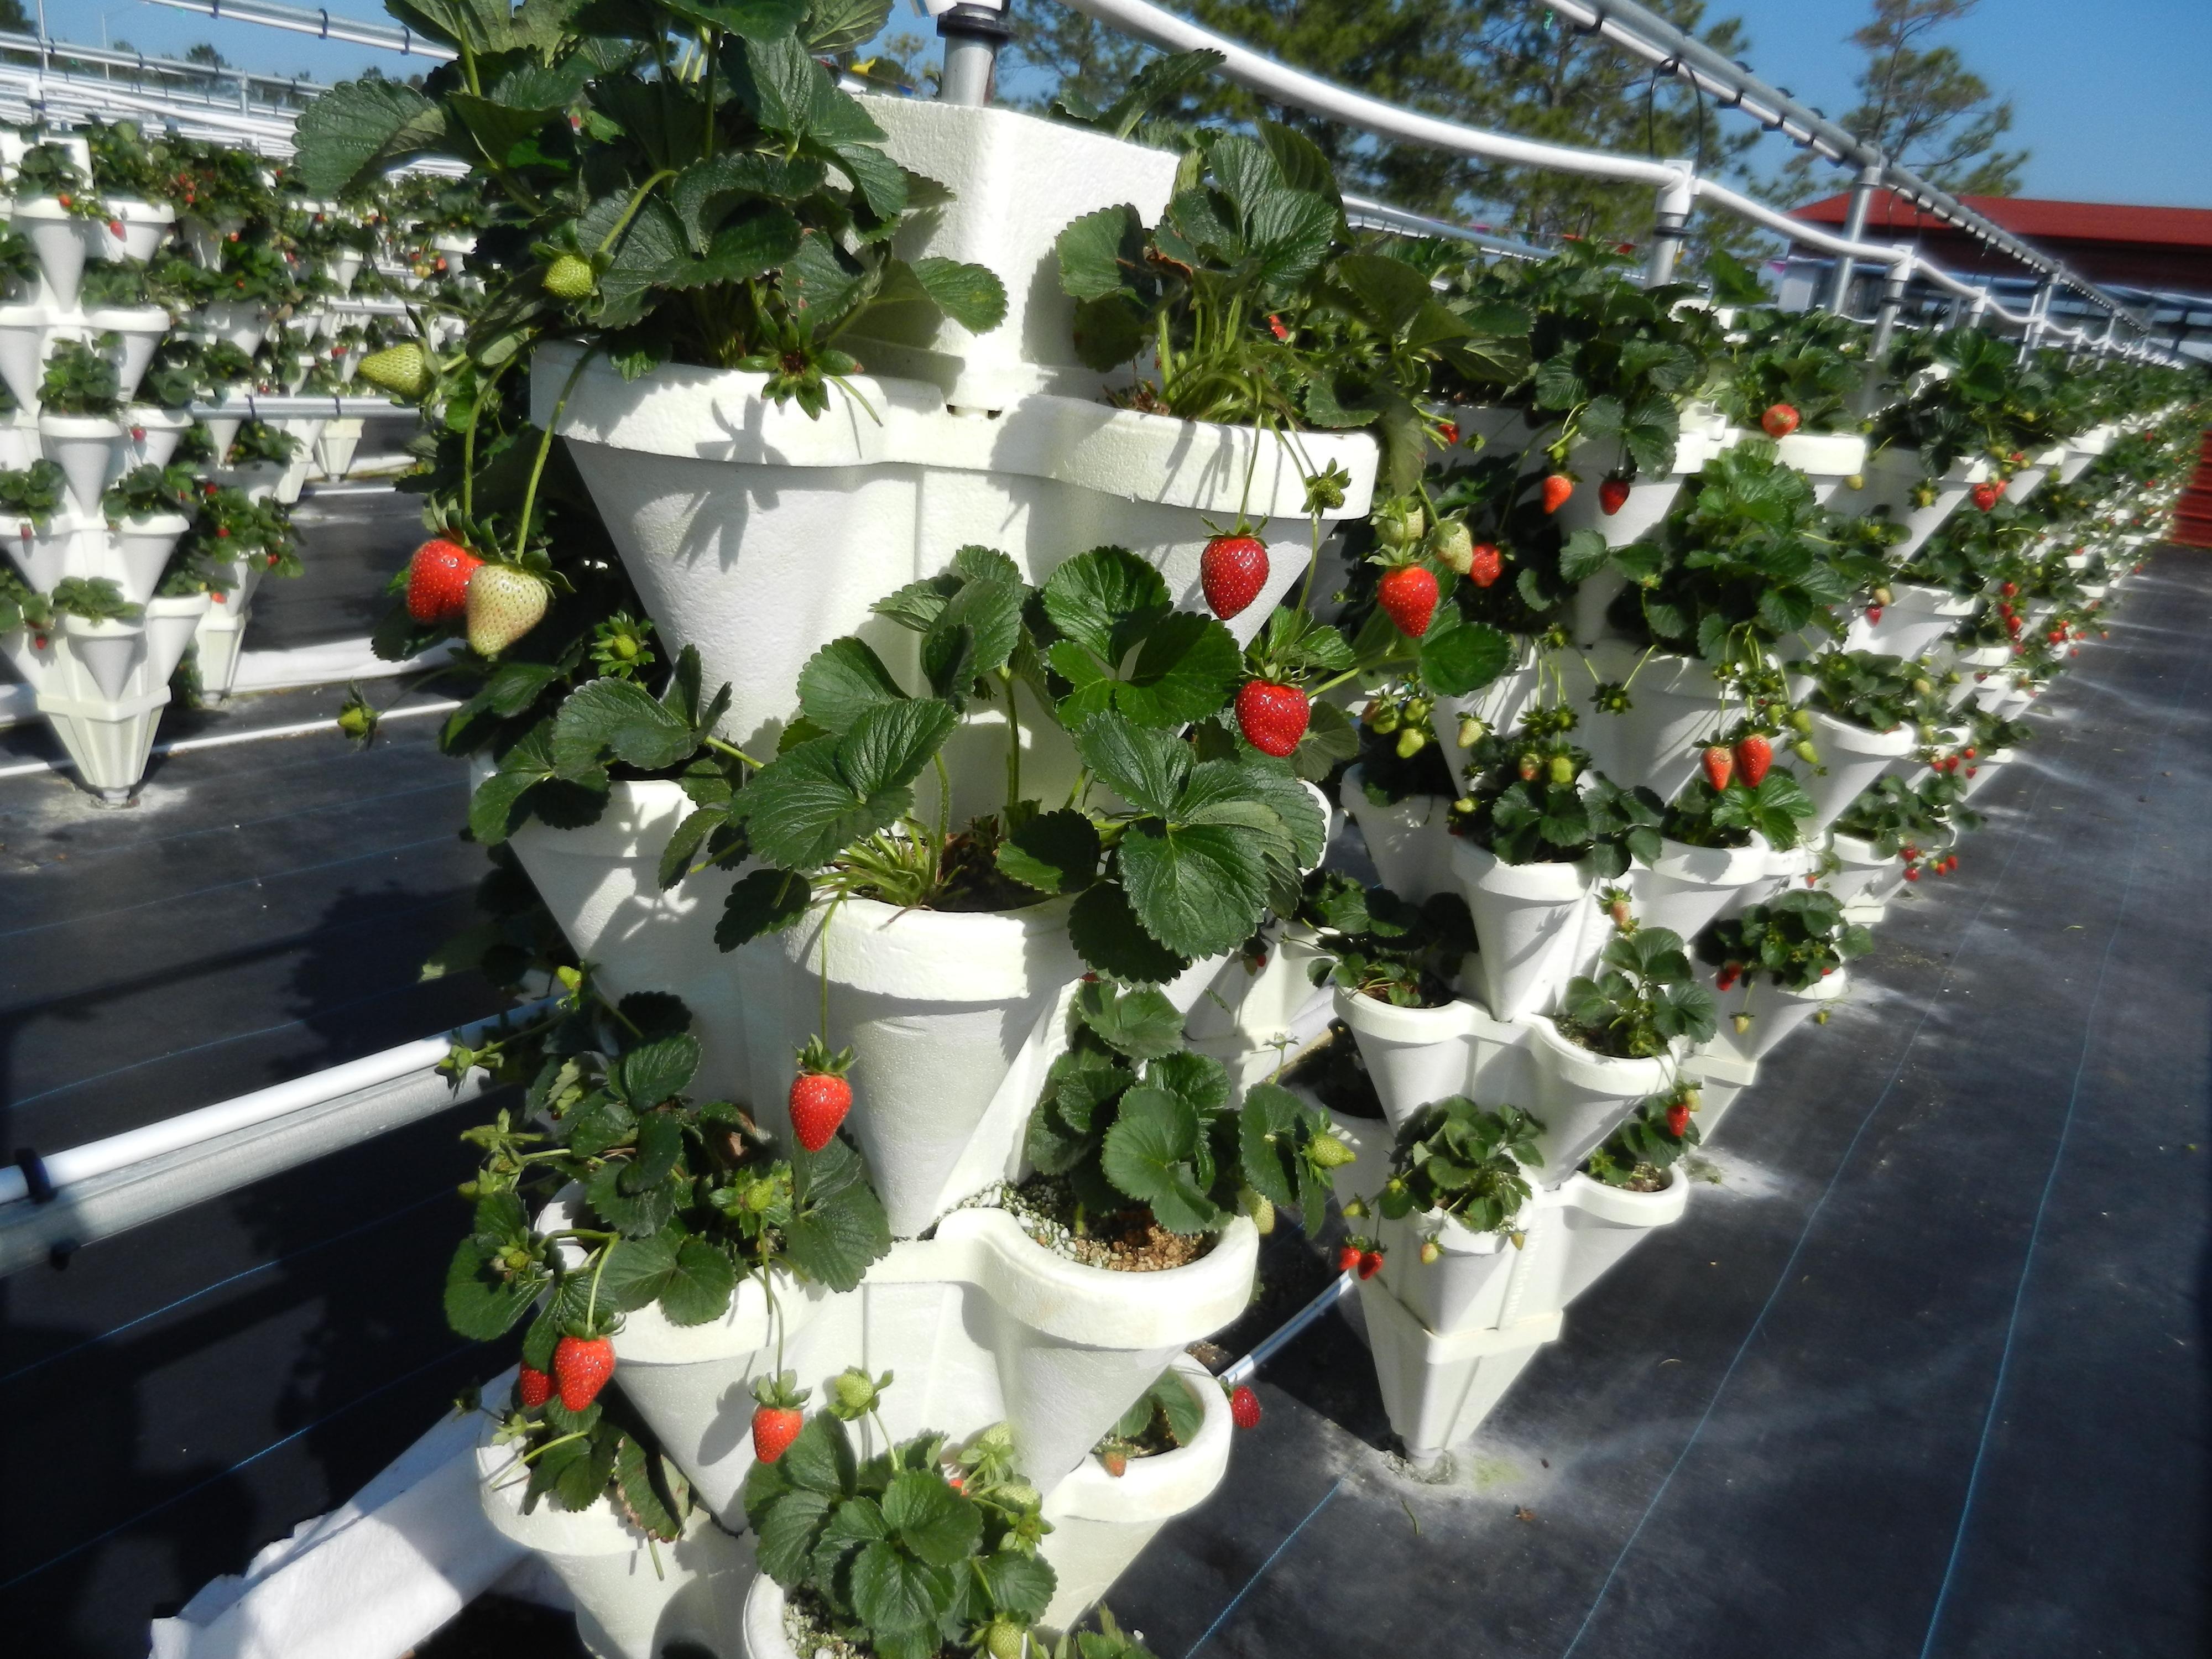 potted strawberry plants fresh fruit u-pick